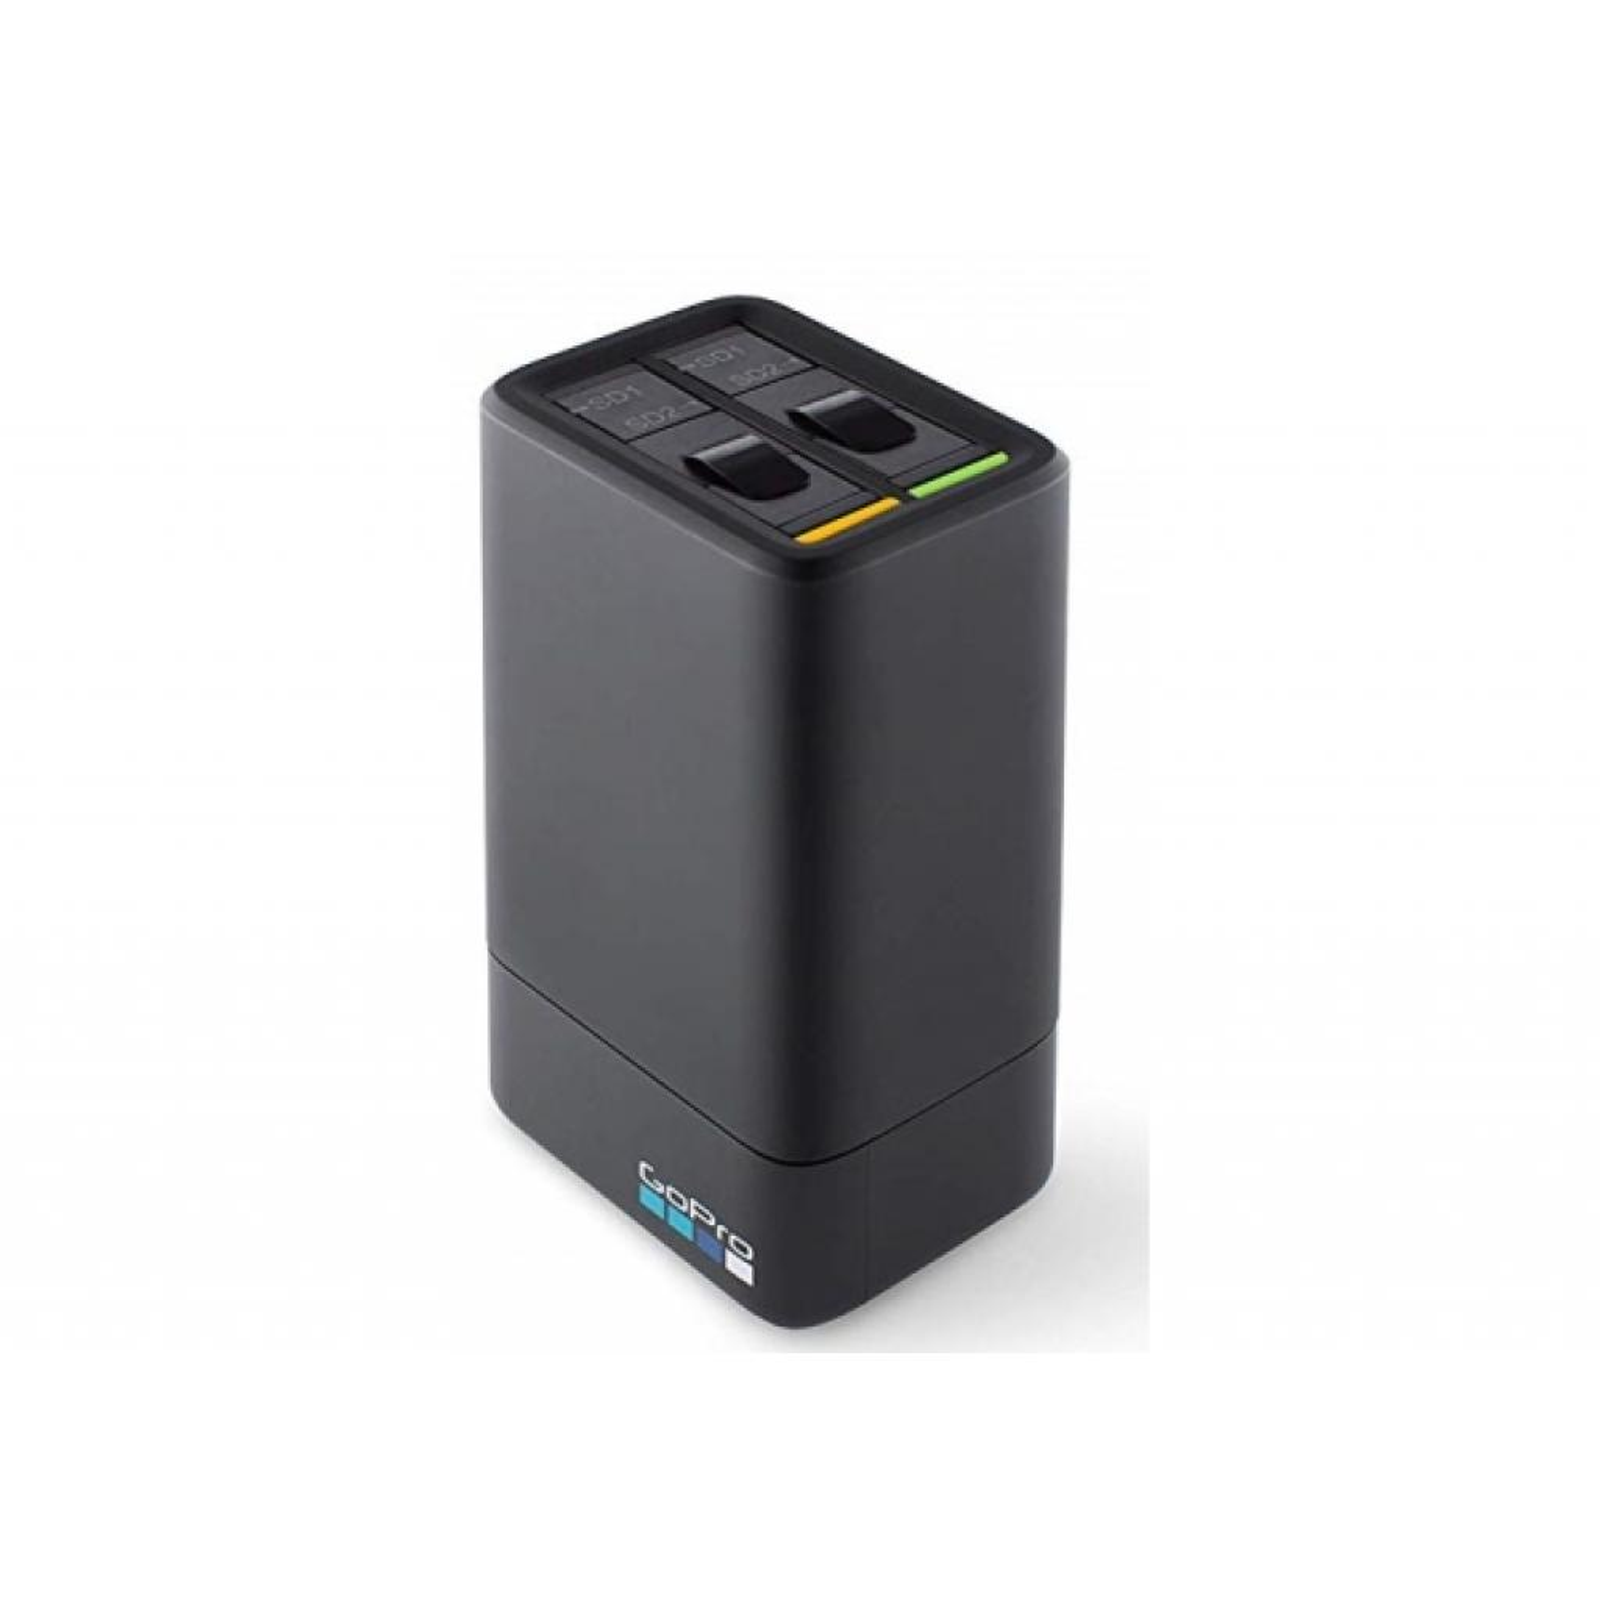 Аксессуар к экшн-камерам GoPro Fusion Dual Battery Charger + Battery (ASDBC-001-EU) изображение 2